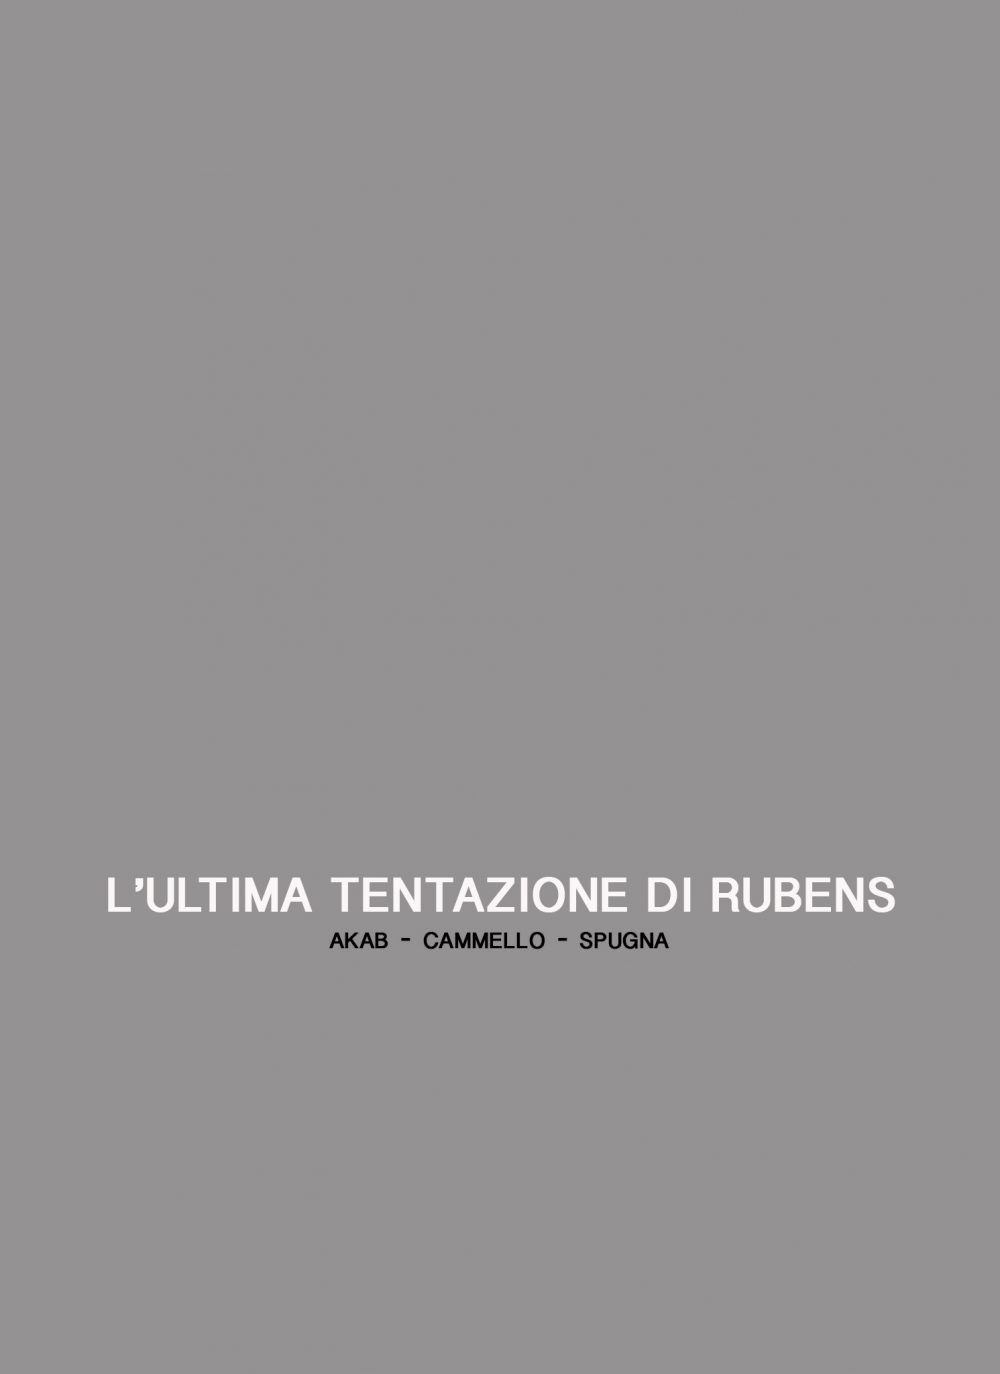 Rubens, anteprima 01